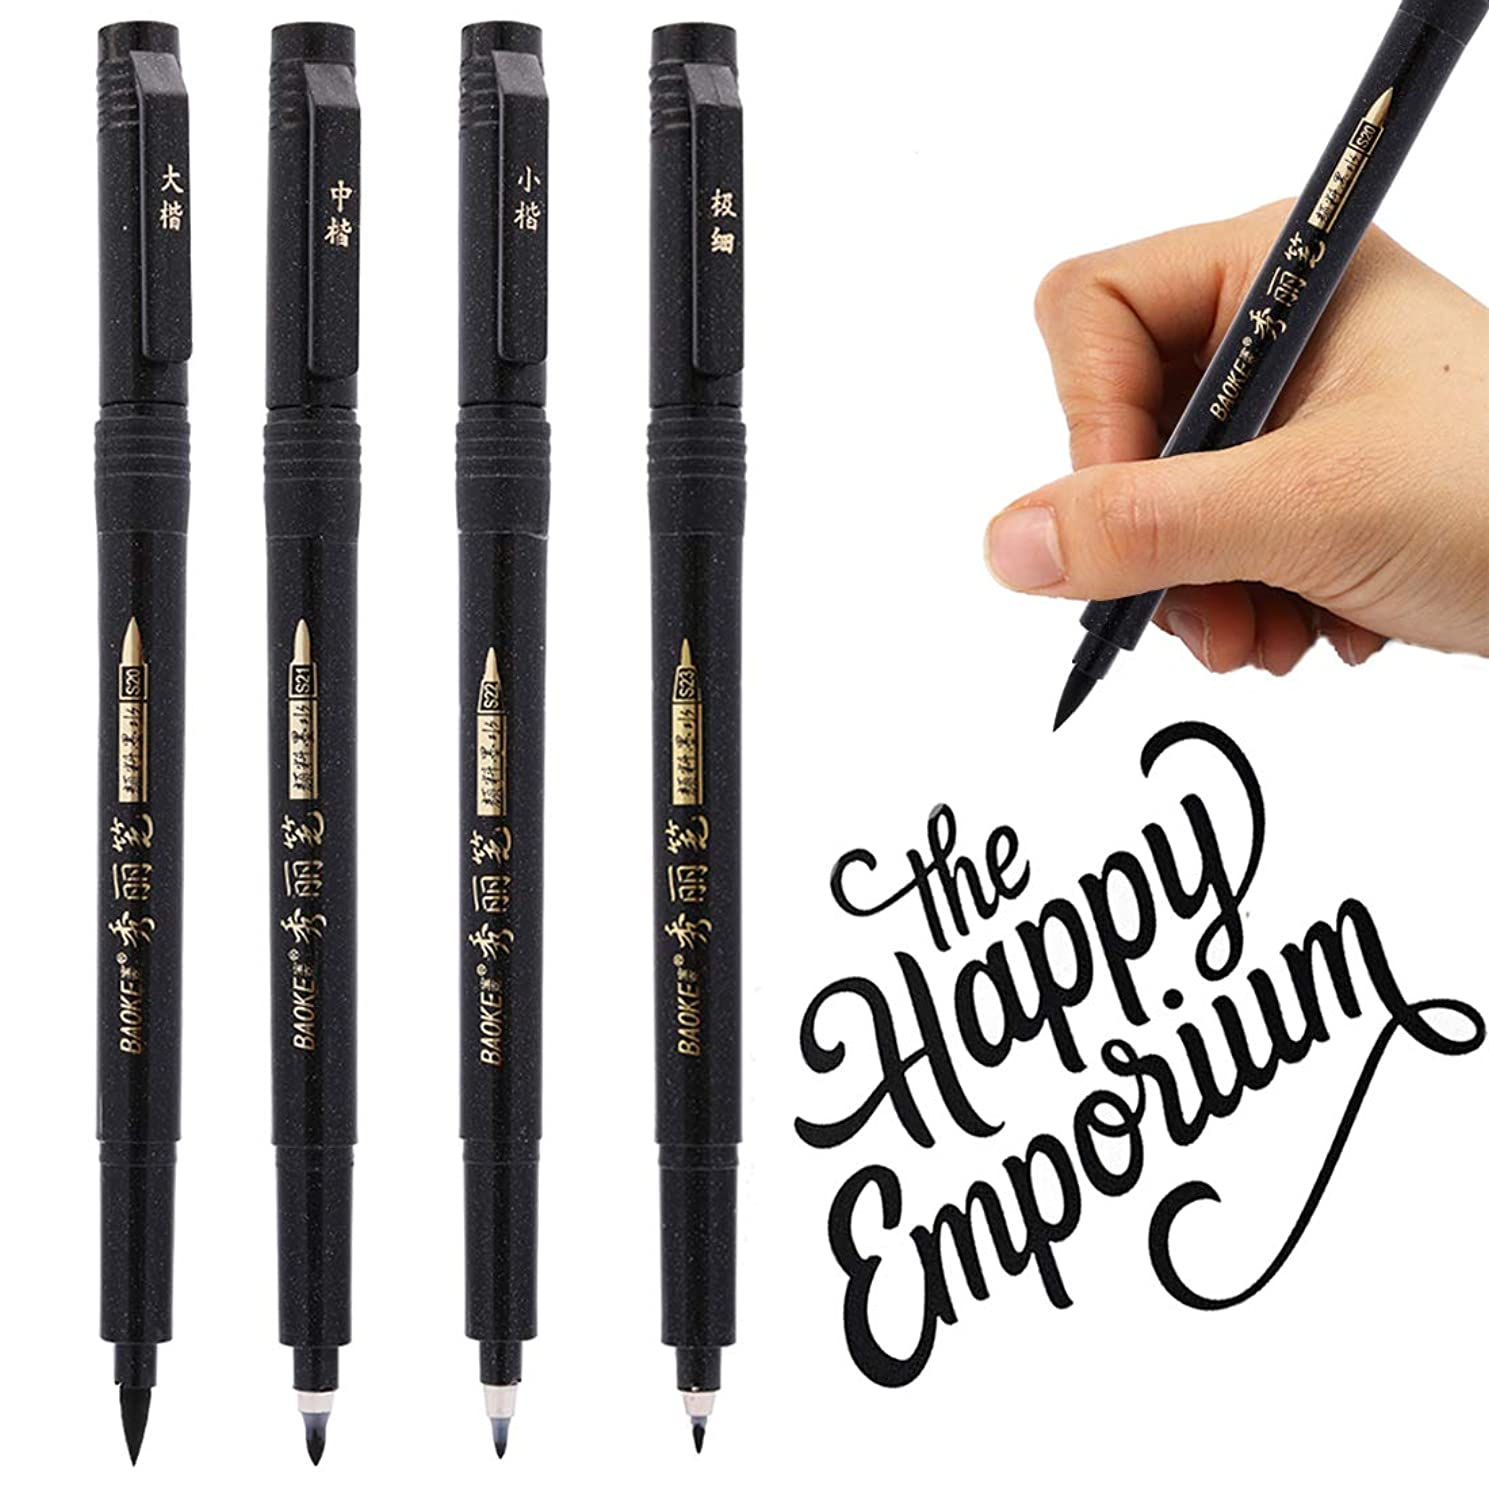 Refillable Brush Marker Pens for Hand Lettering - 4 Size Black Calligraphy Ink Pen for Beginners Writing, Signature, Illustration, Design